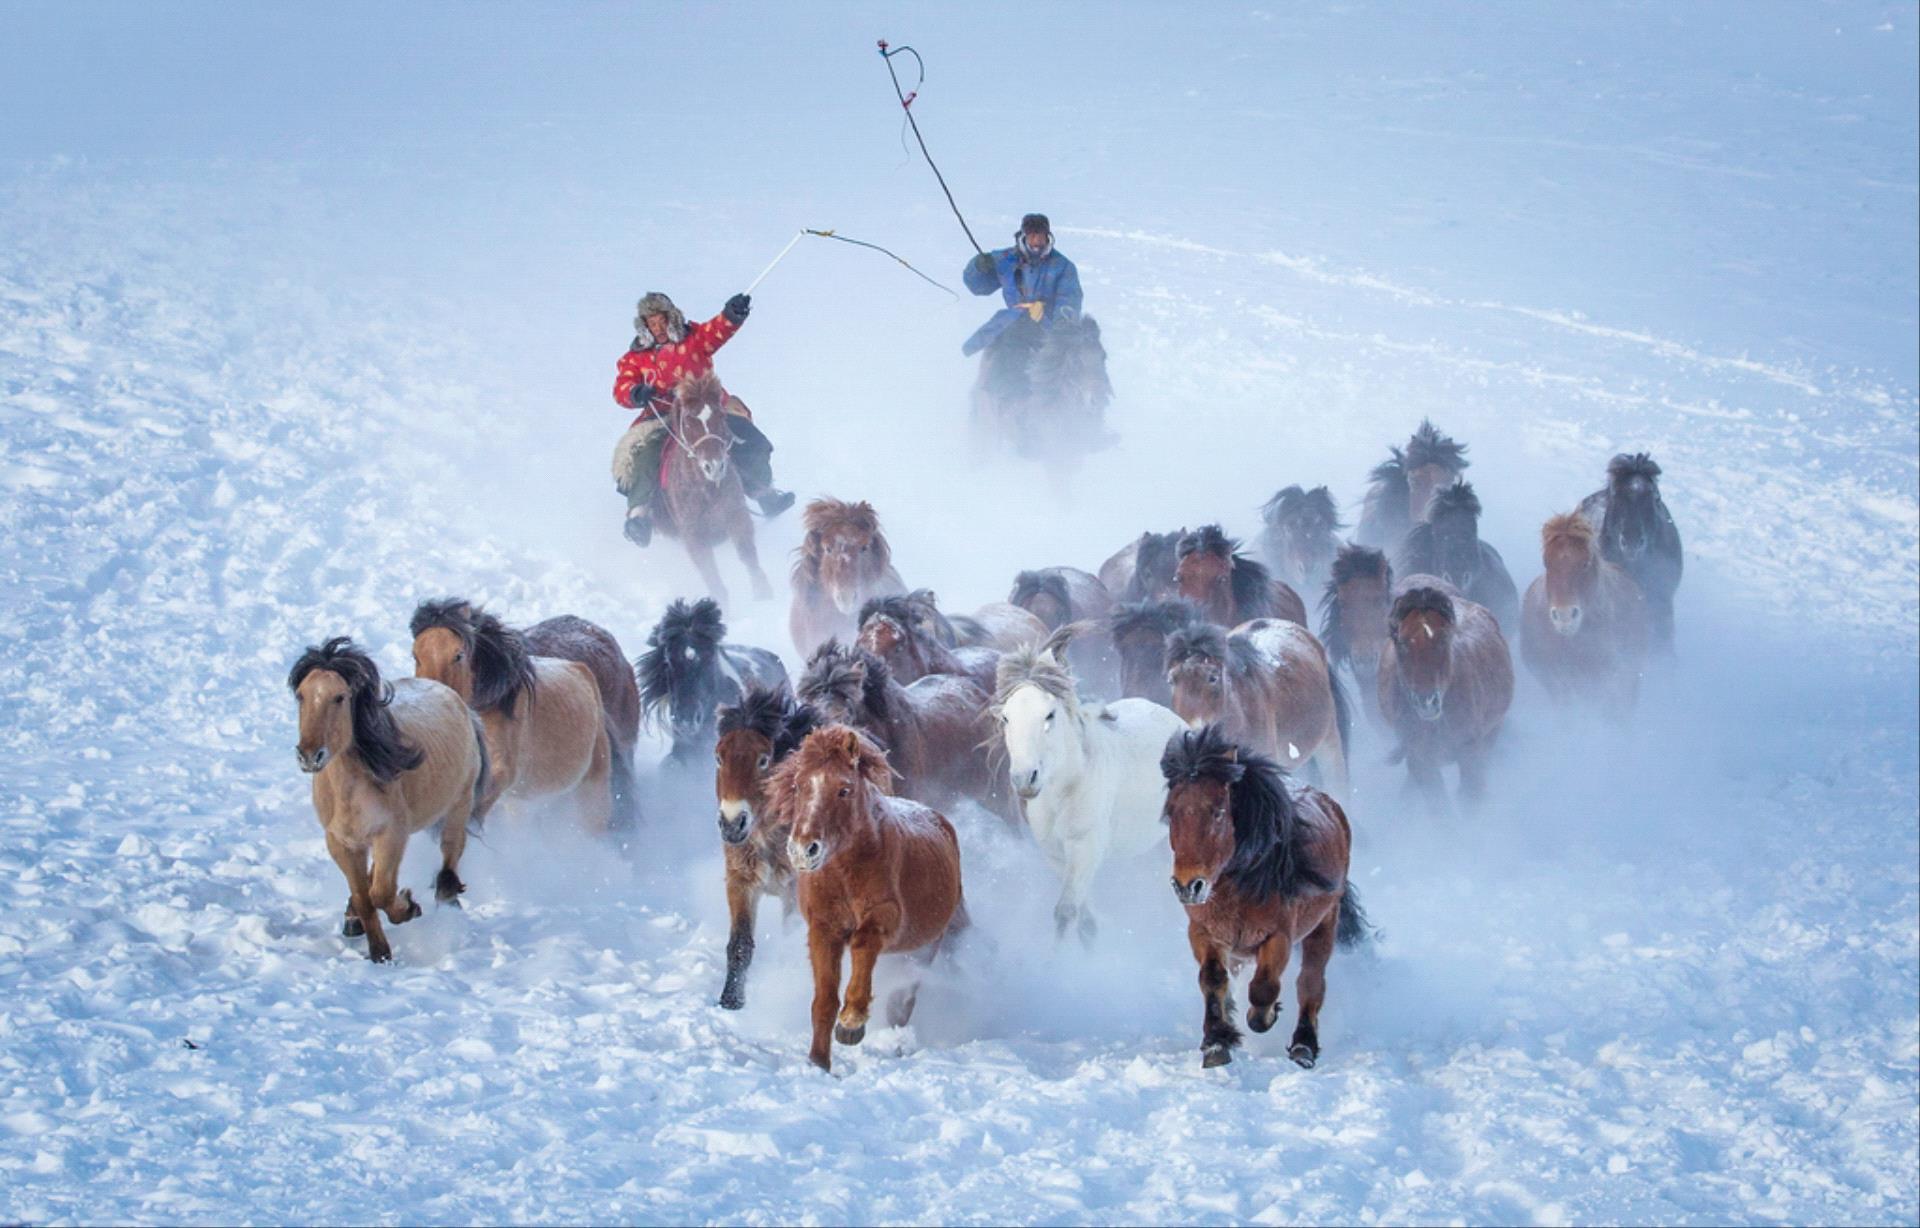 IUP HM - Yongan Gan (China)  Riding